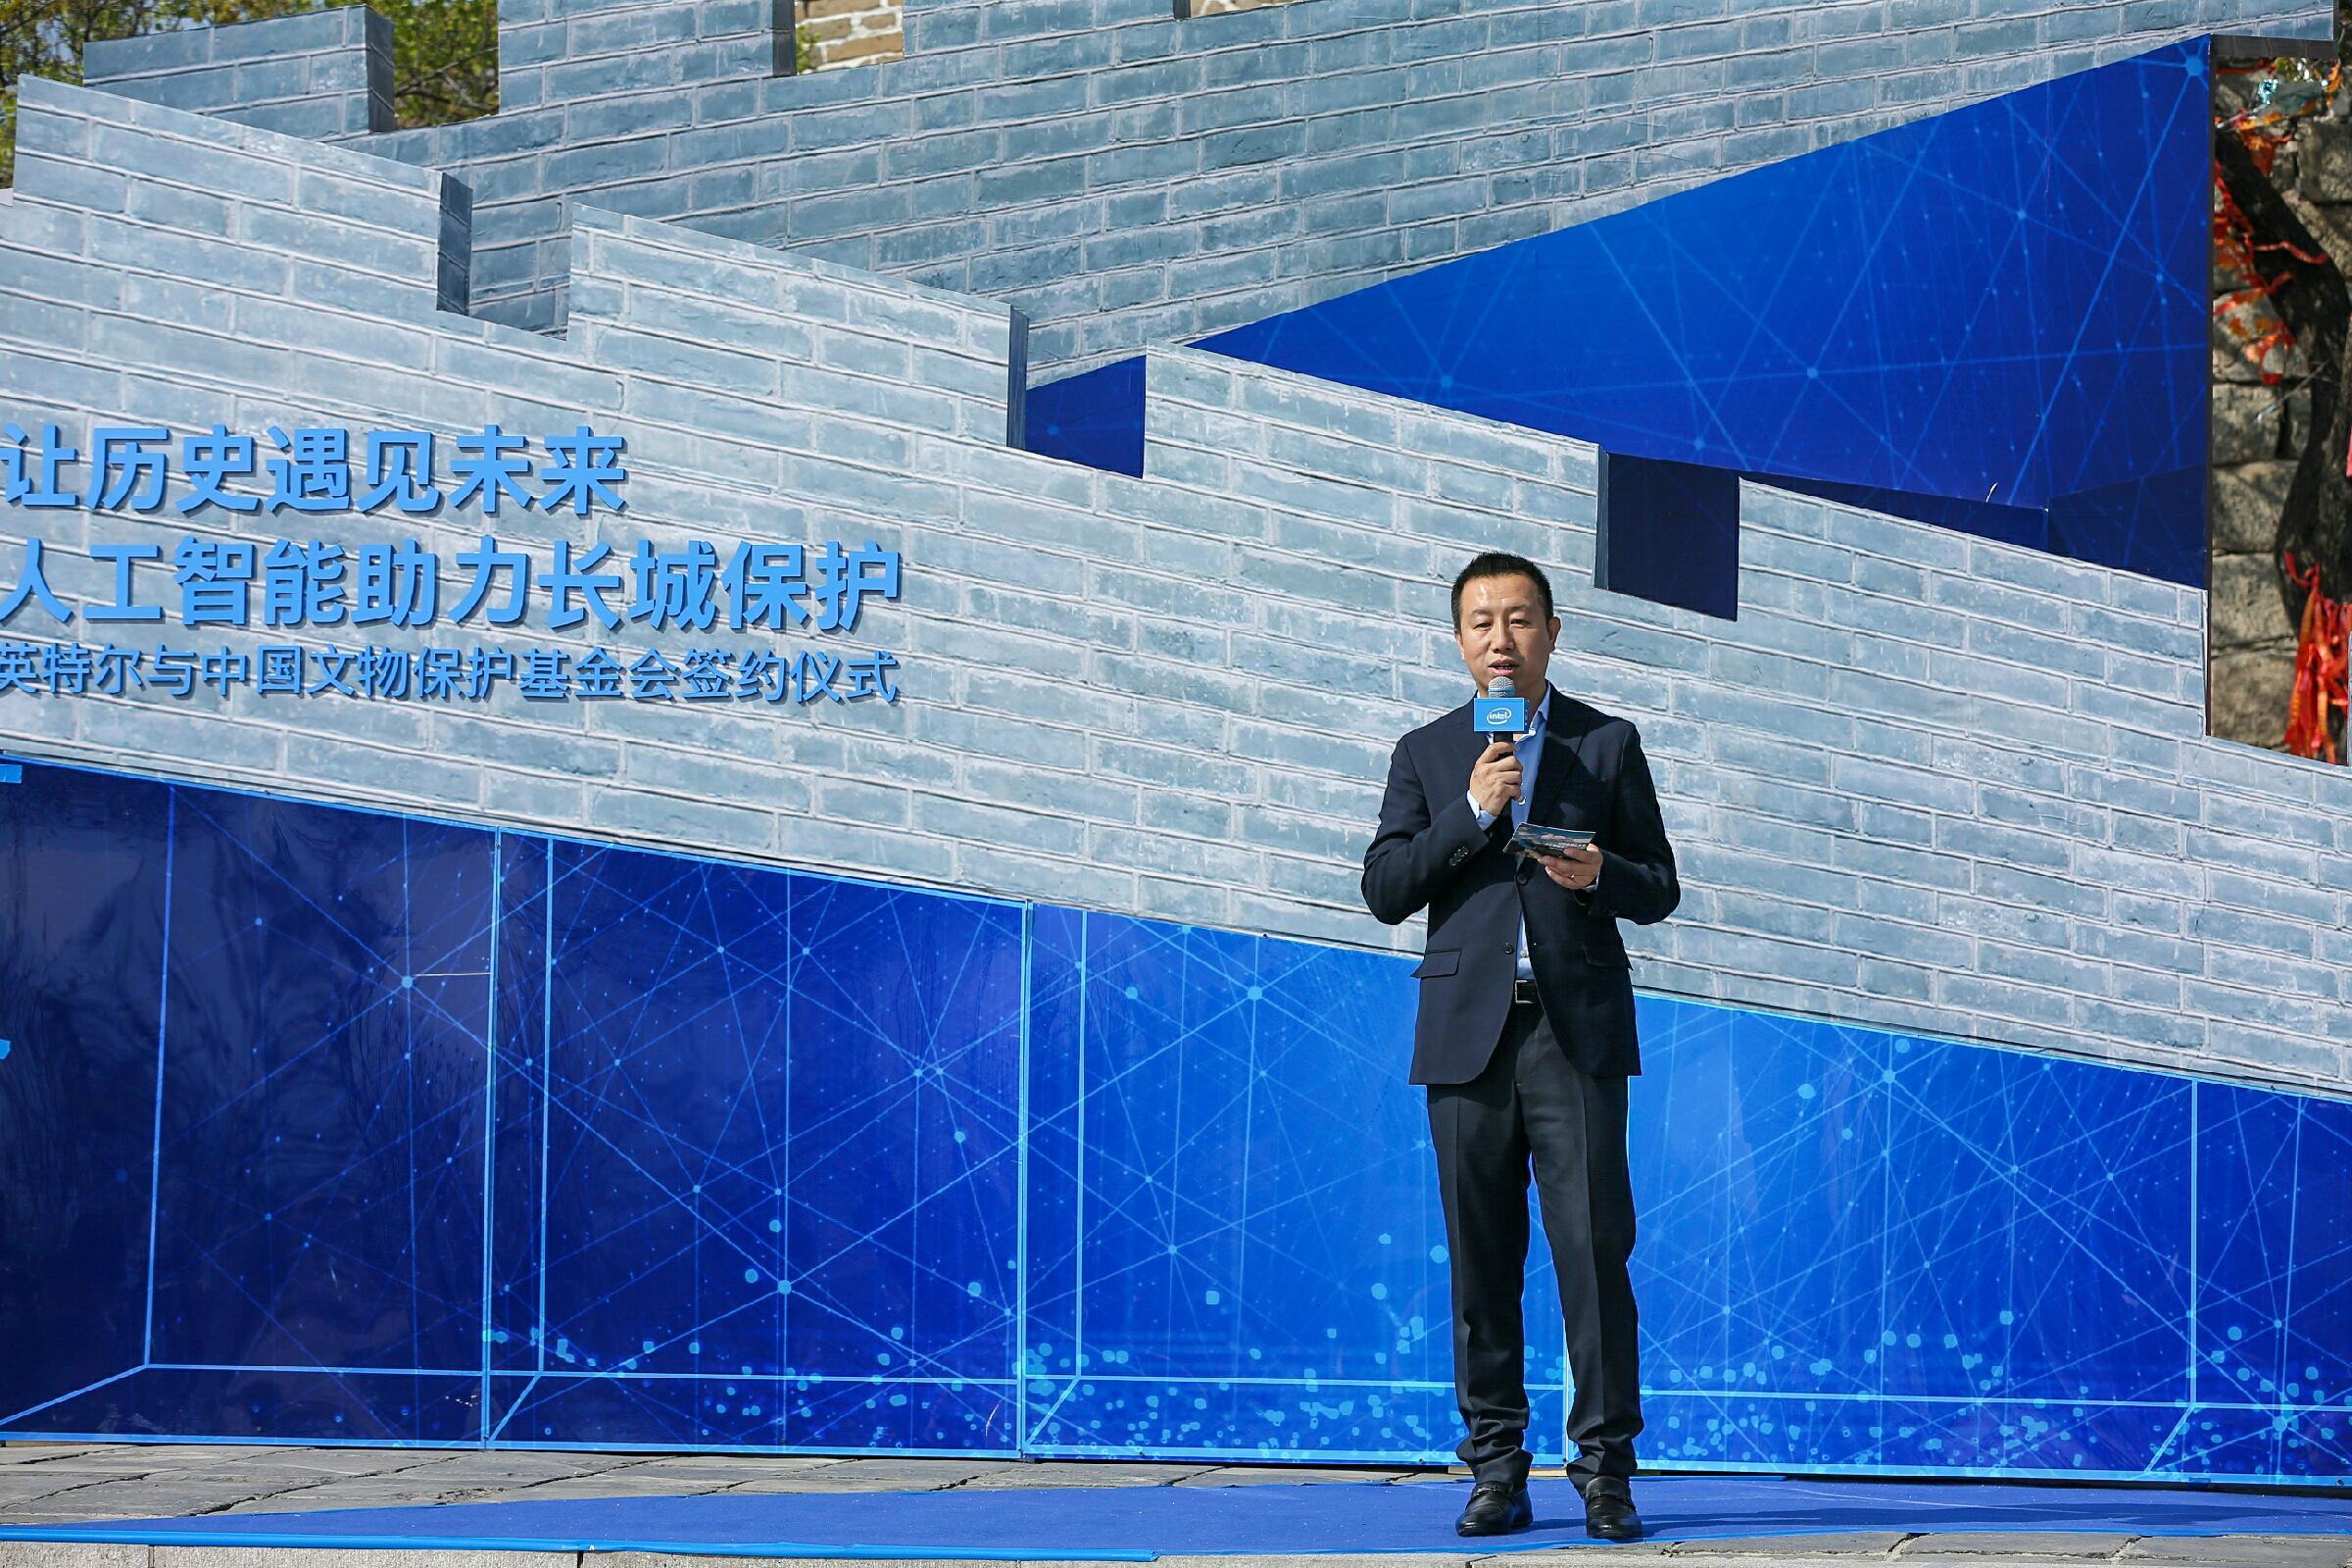 AI助力长城保护 智能技术推动世界文化遗产传承